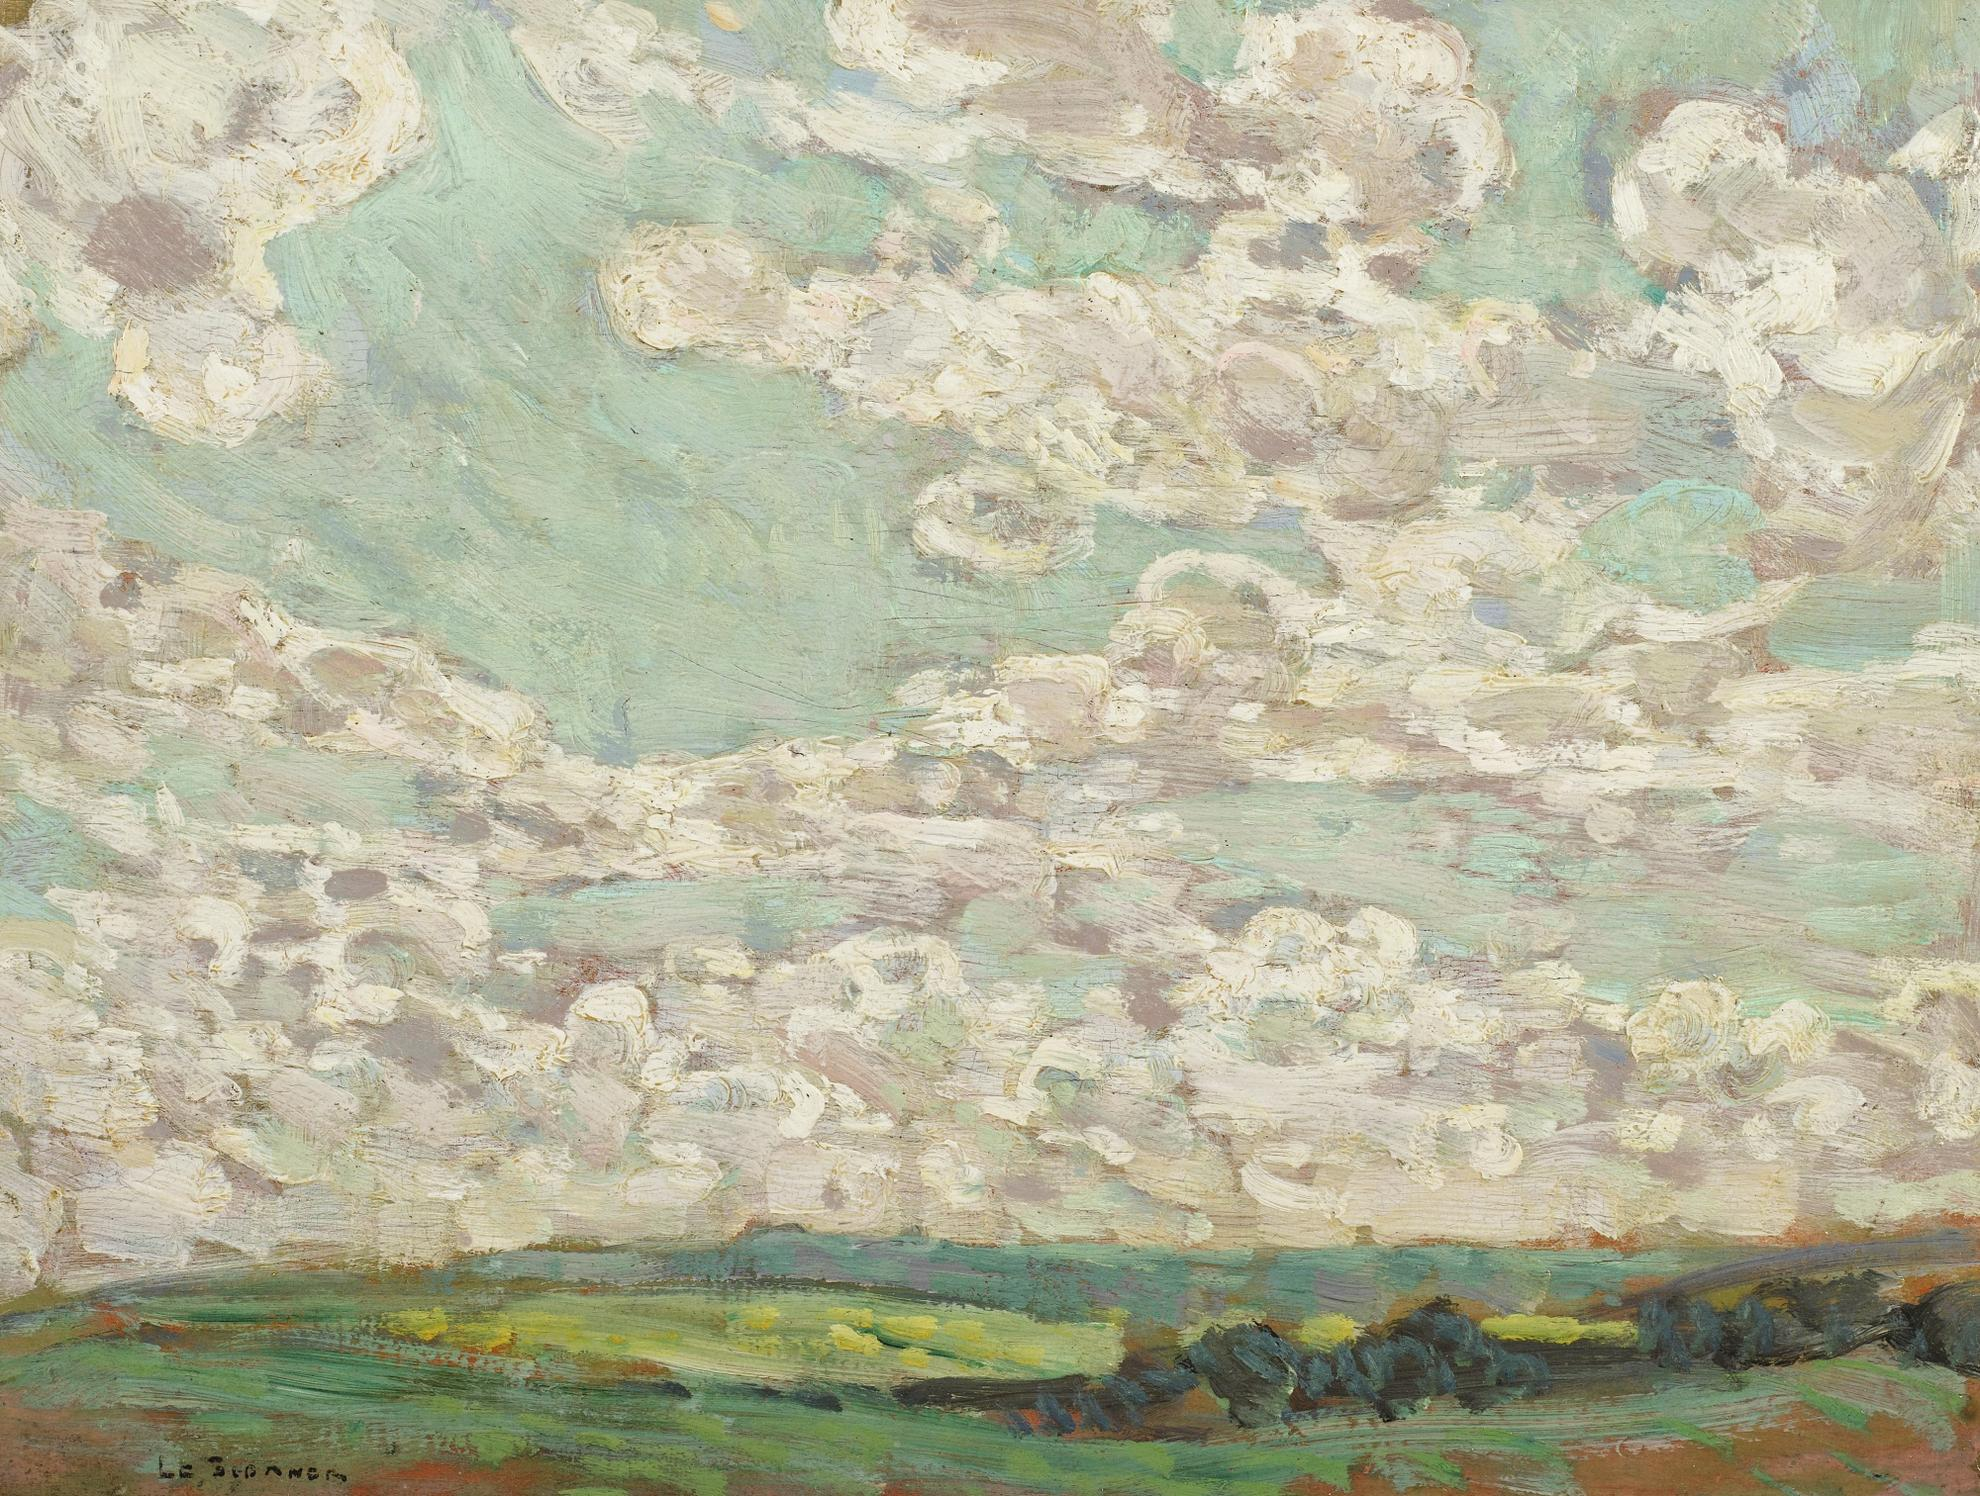 Henri Eugene Le Sidaner-Ciel De Printemps, Gerberoy-1913